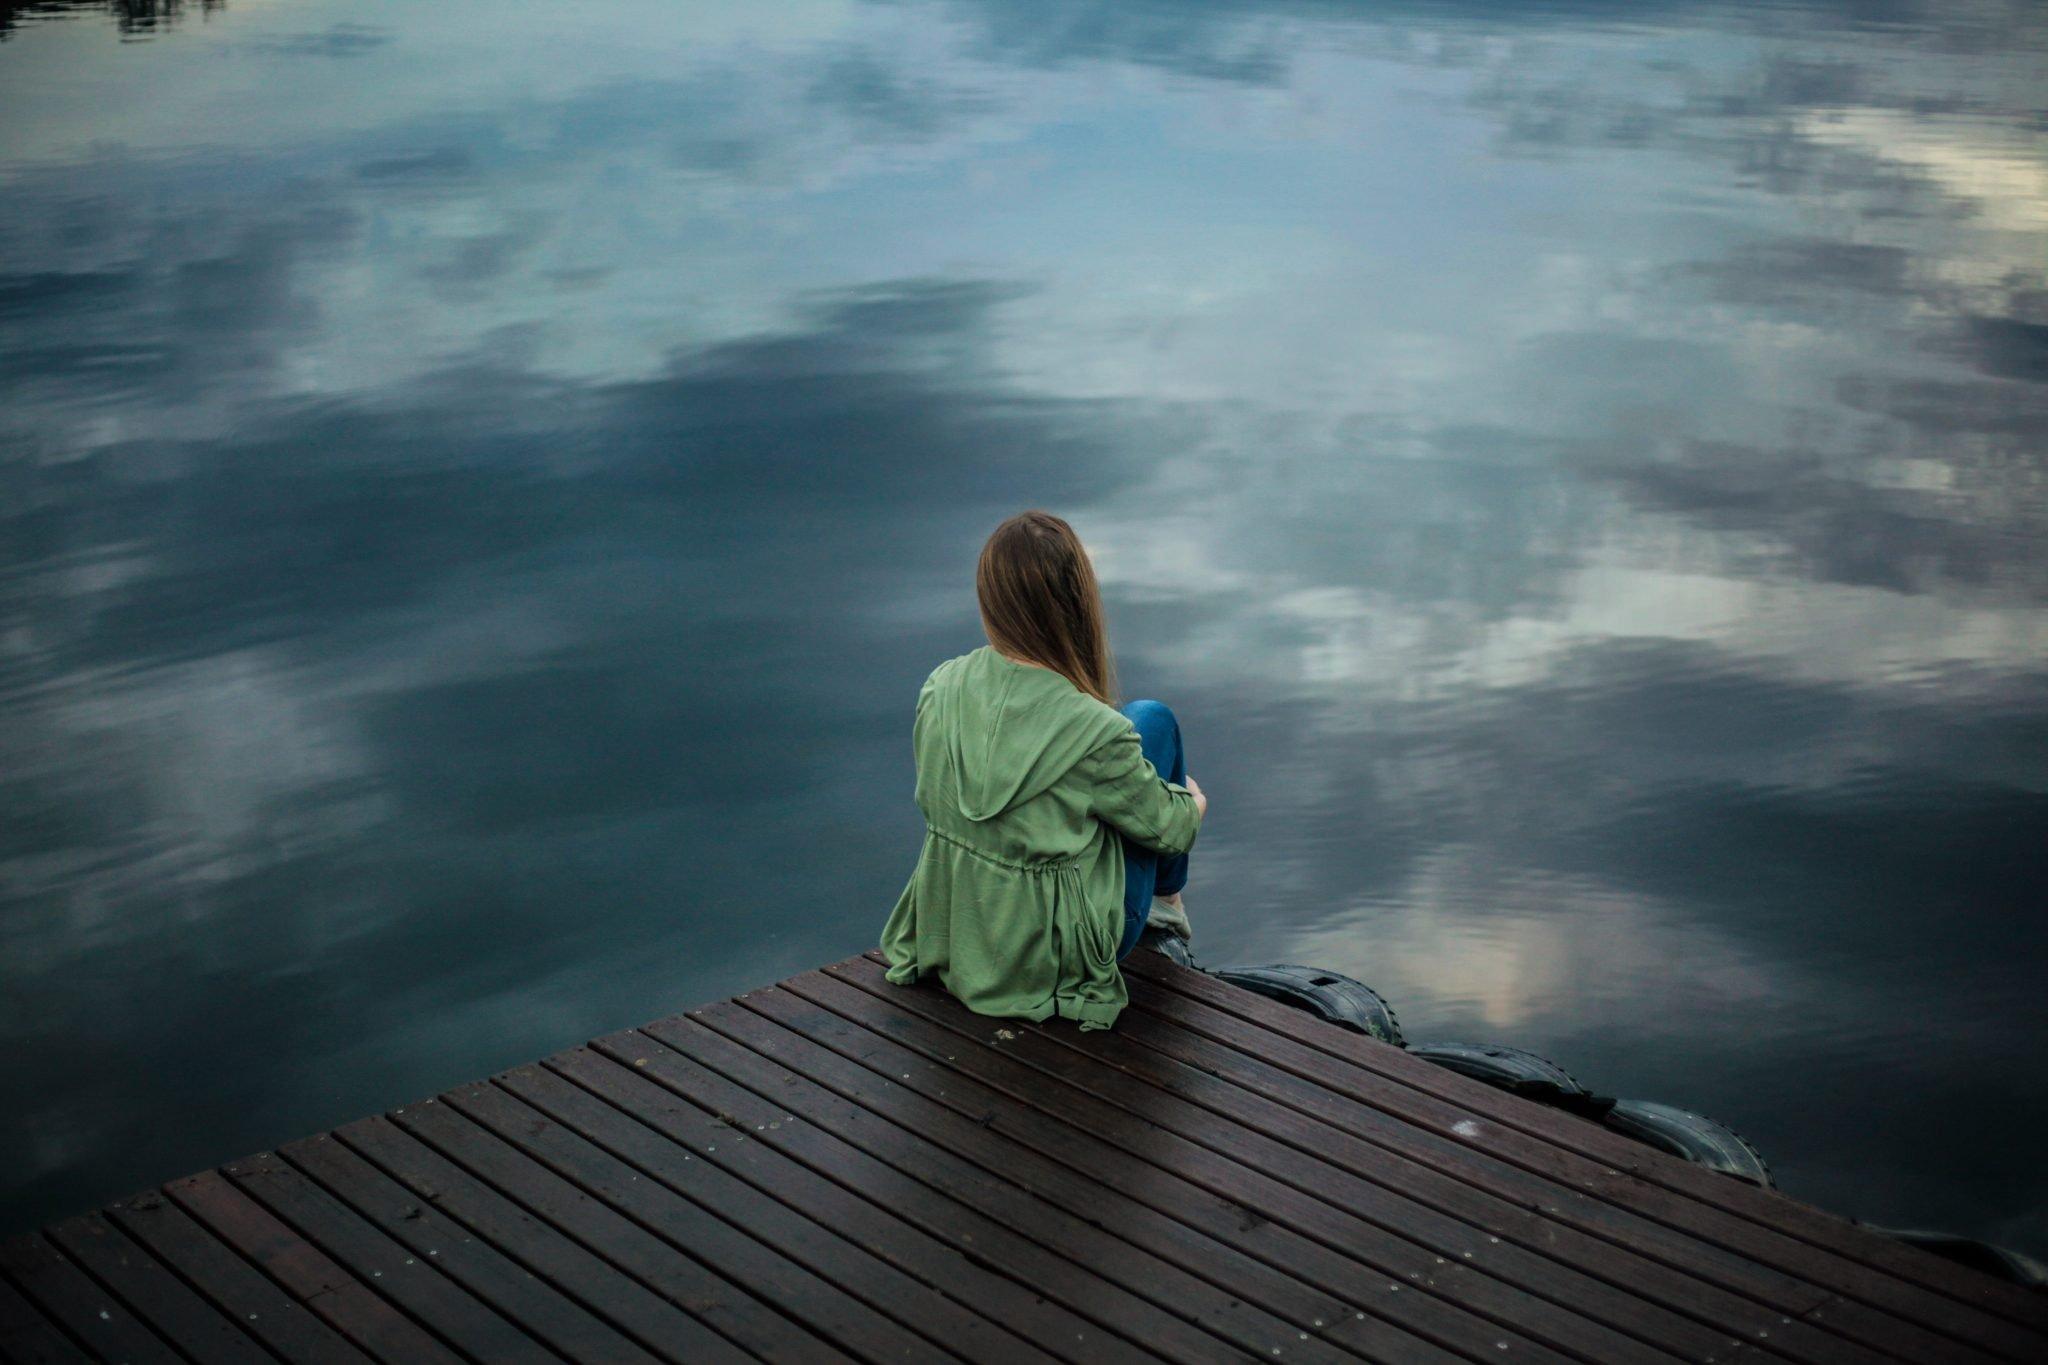 Poem: The Unpeeling